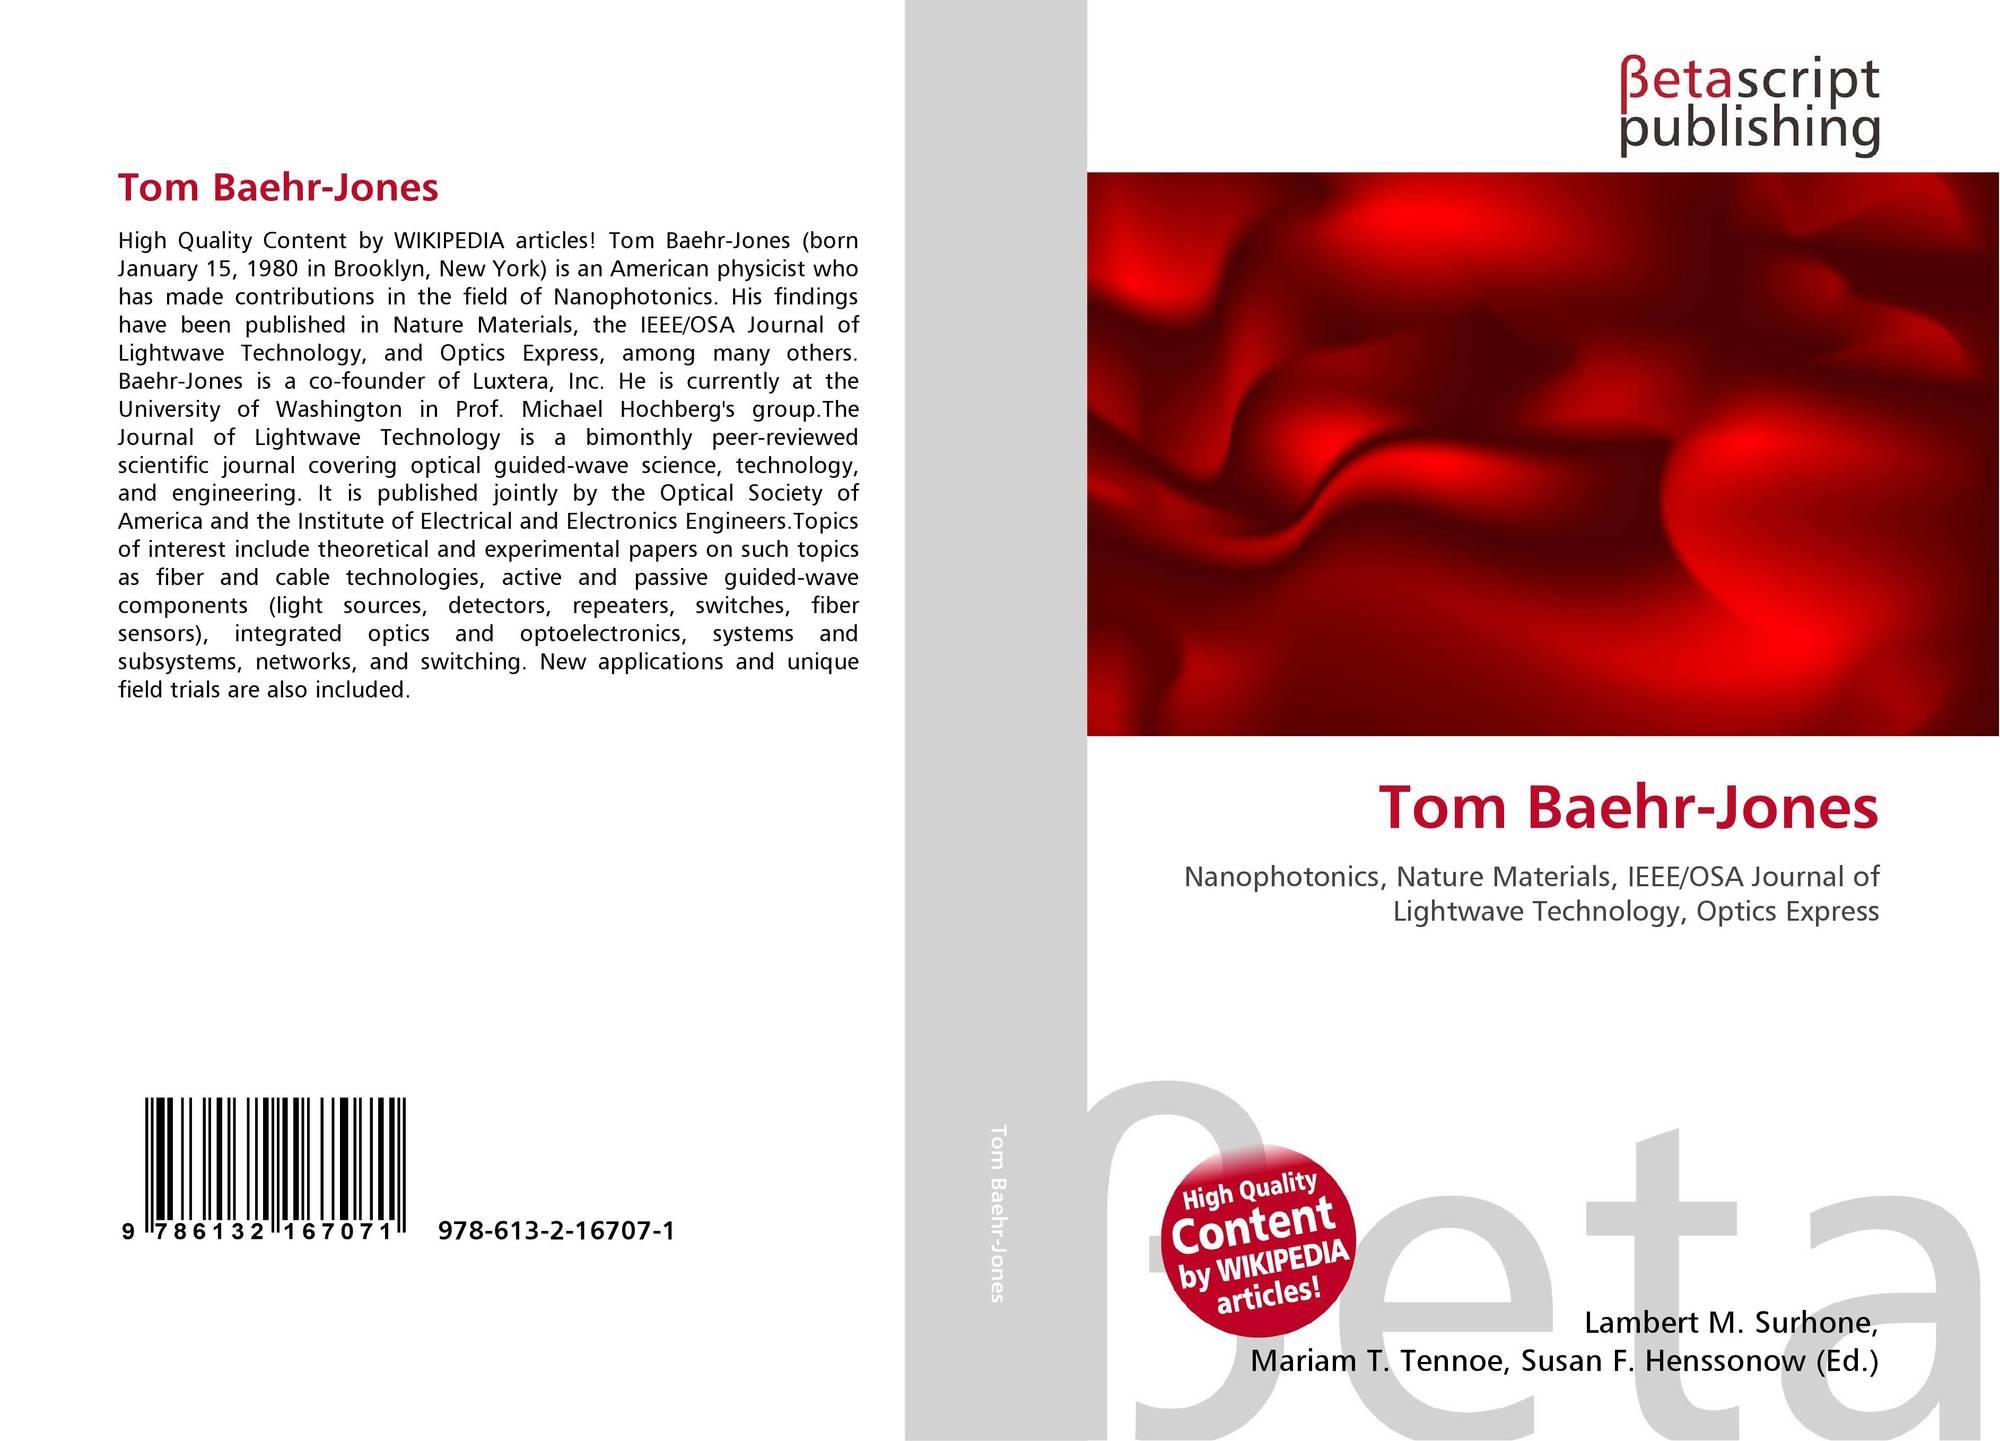 tom baehr-jones thesis C l a s s n o t e s class c l a s s n o t e s class of 1998 special reunion attendees included tom baehr-jones her honors thesis.